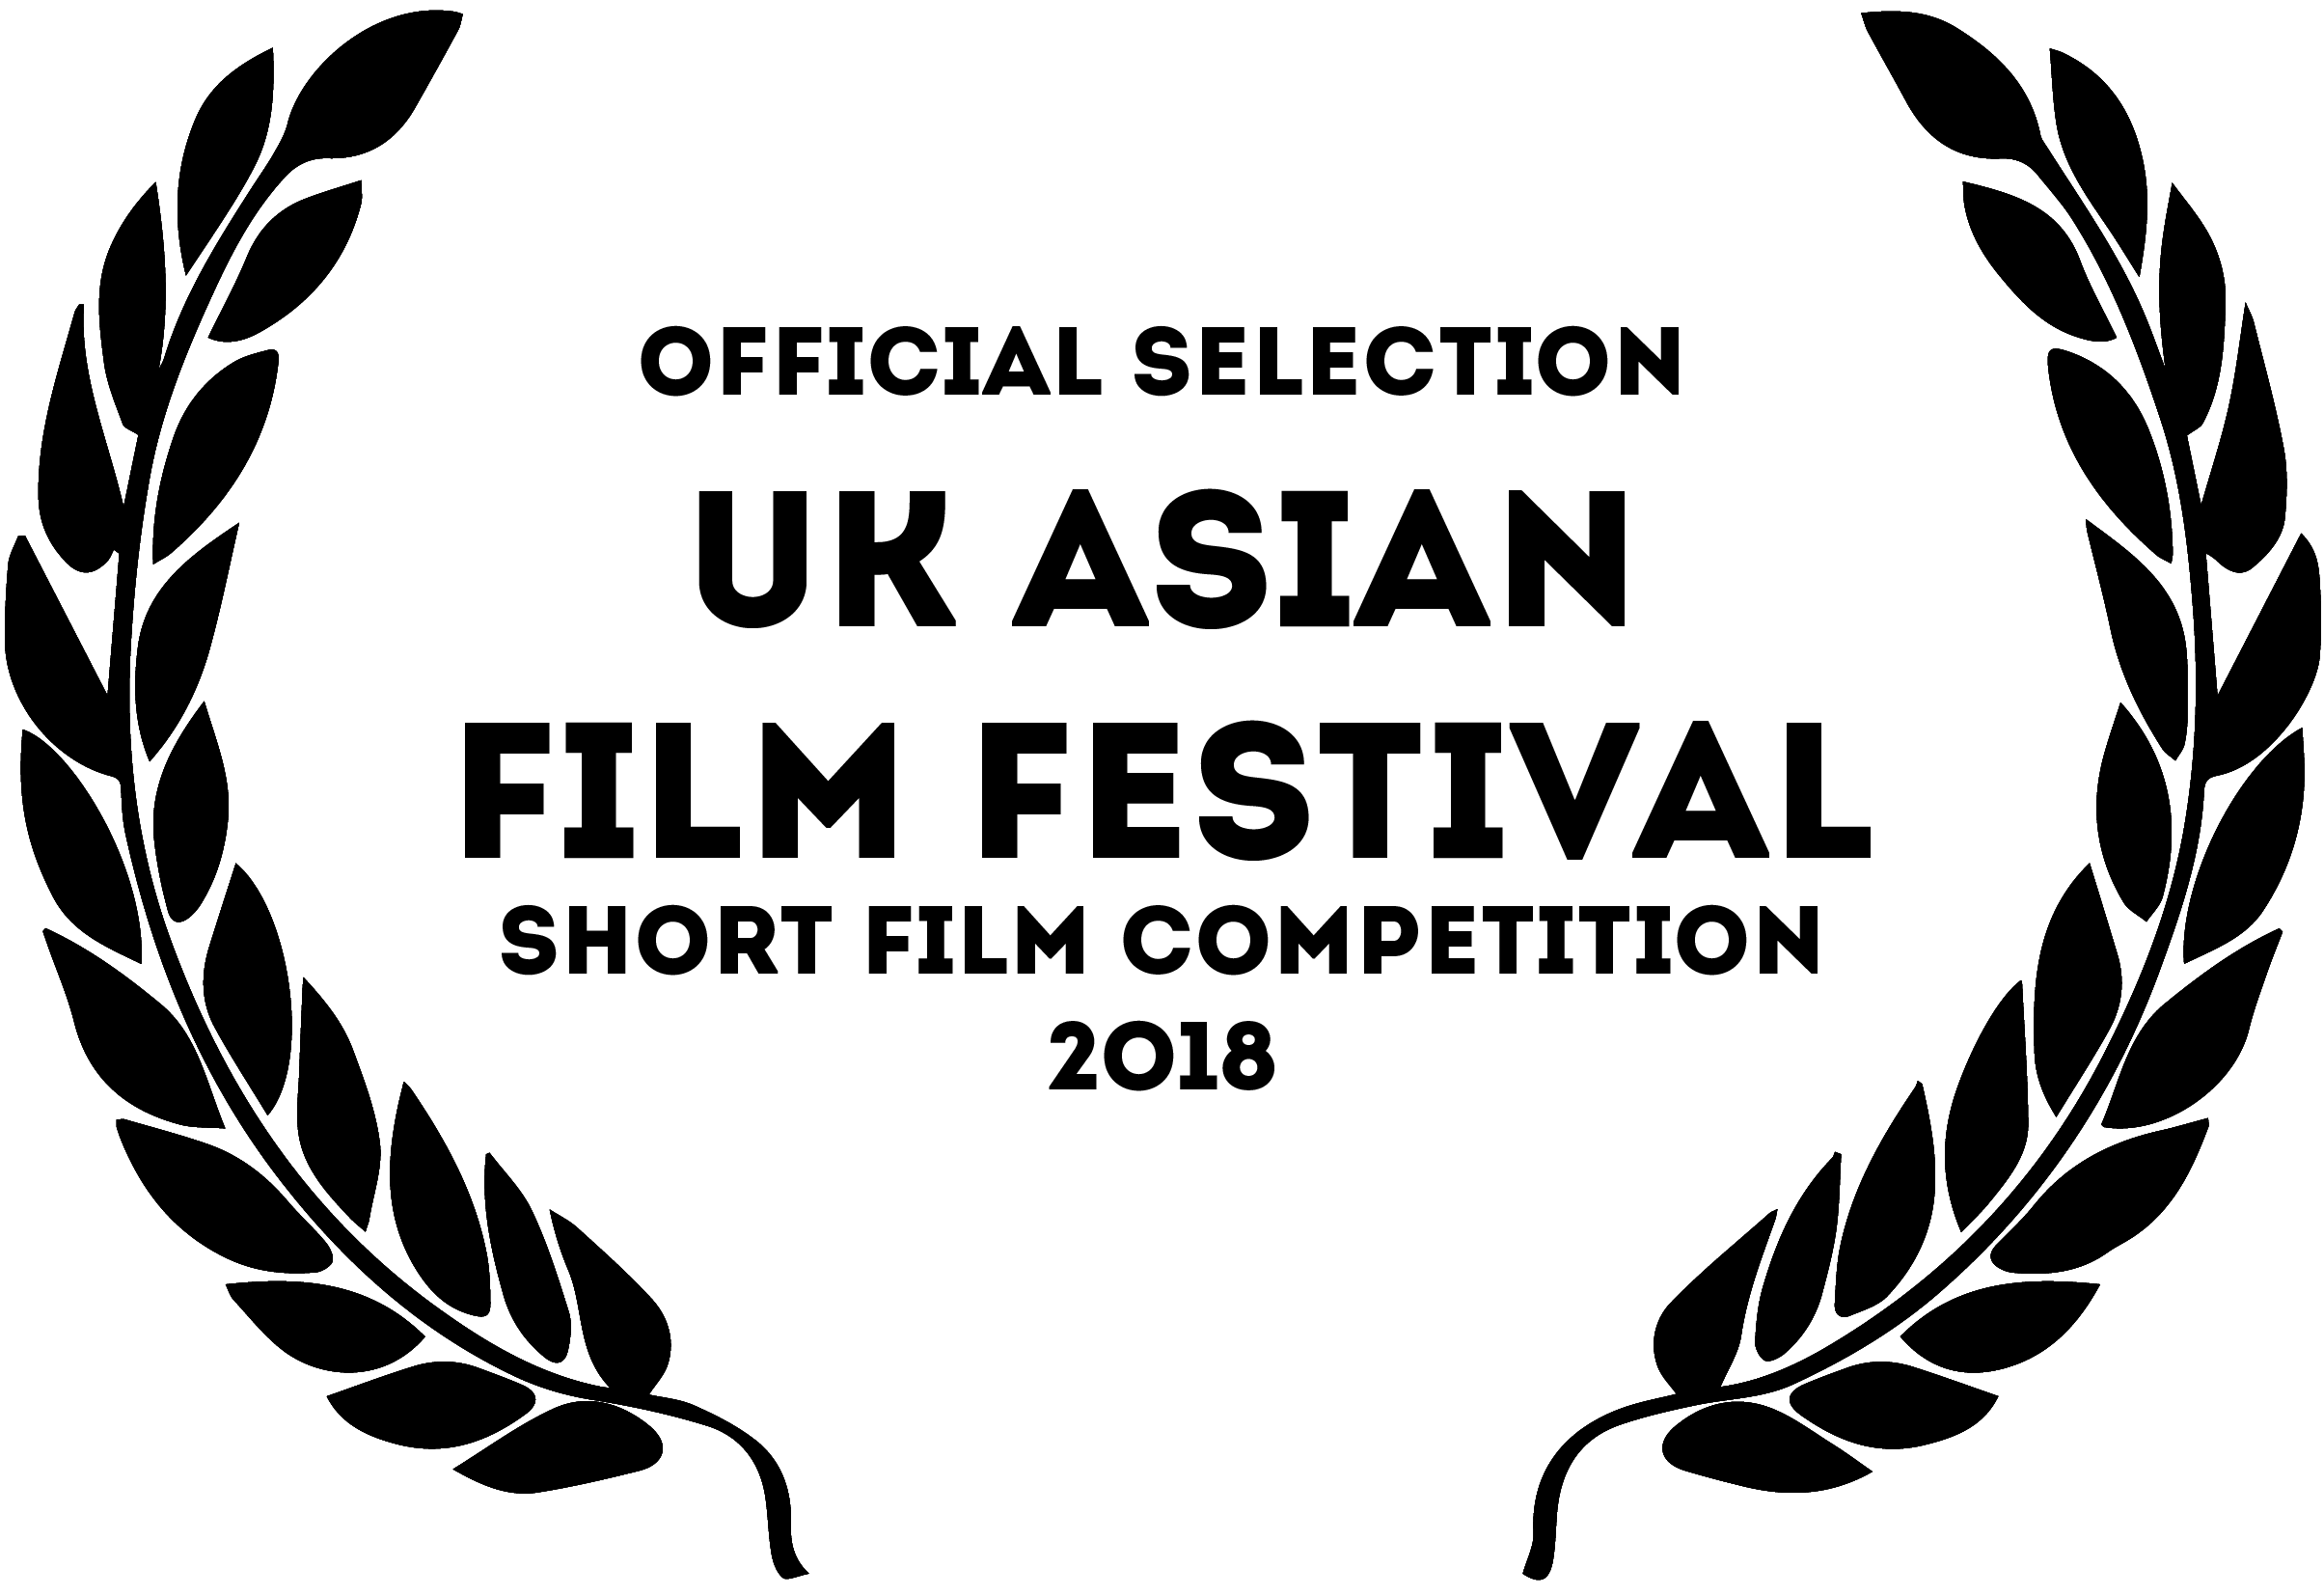 tof-ukaff-film-laurel-short.png